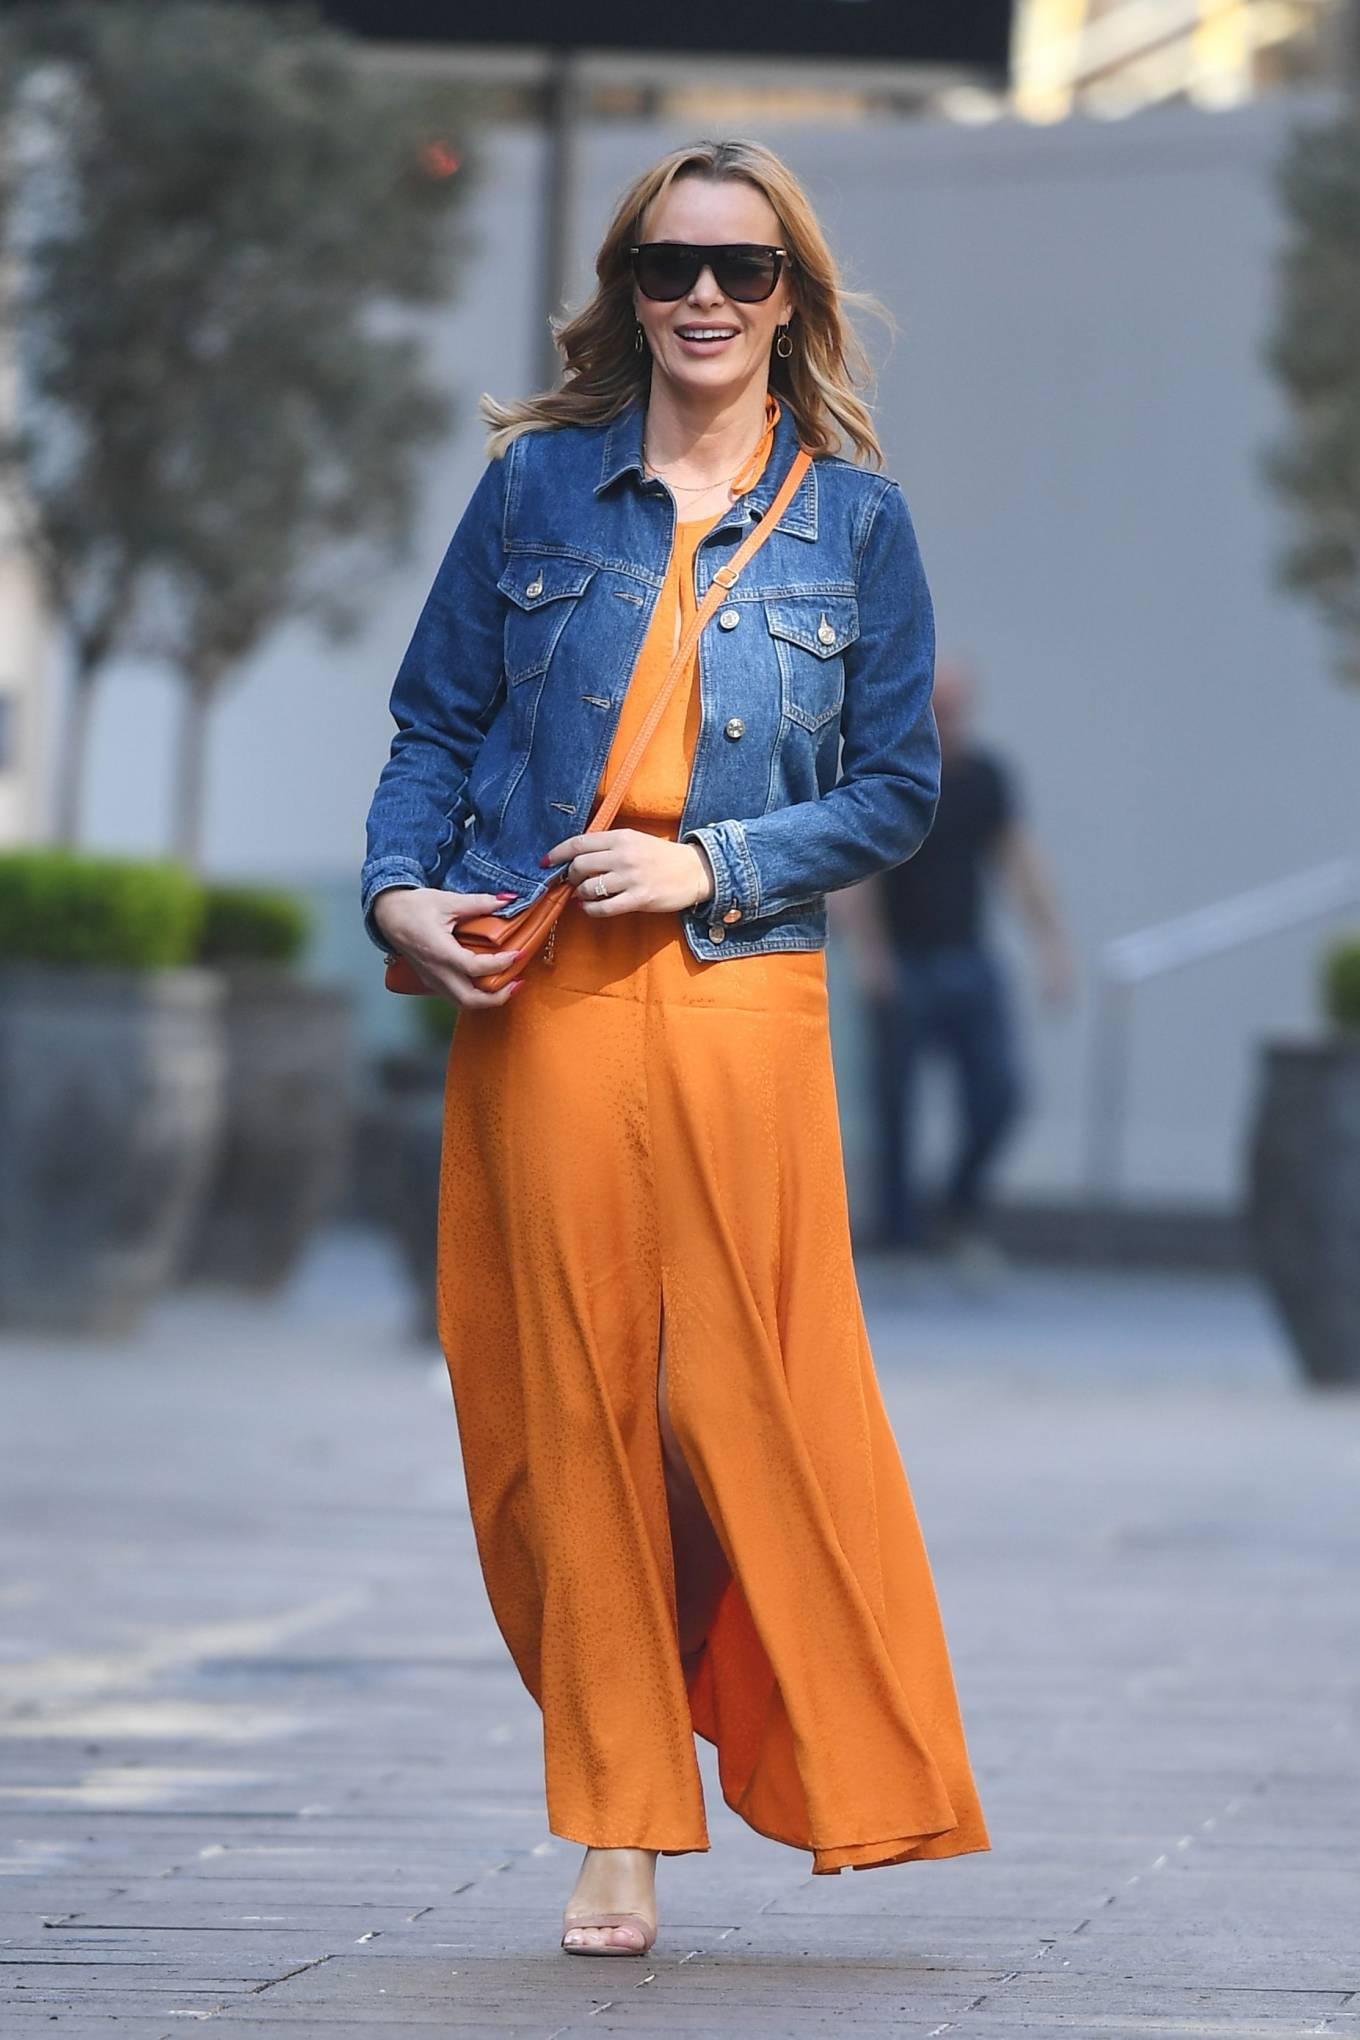 Amanda Holden - In dress leaving the Global Radio Studios in London